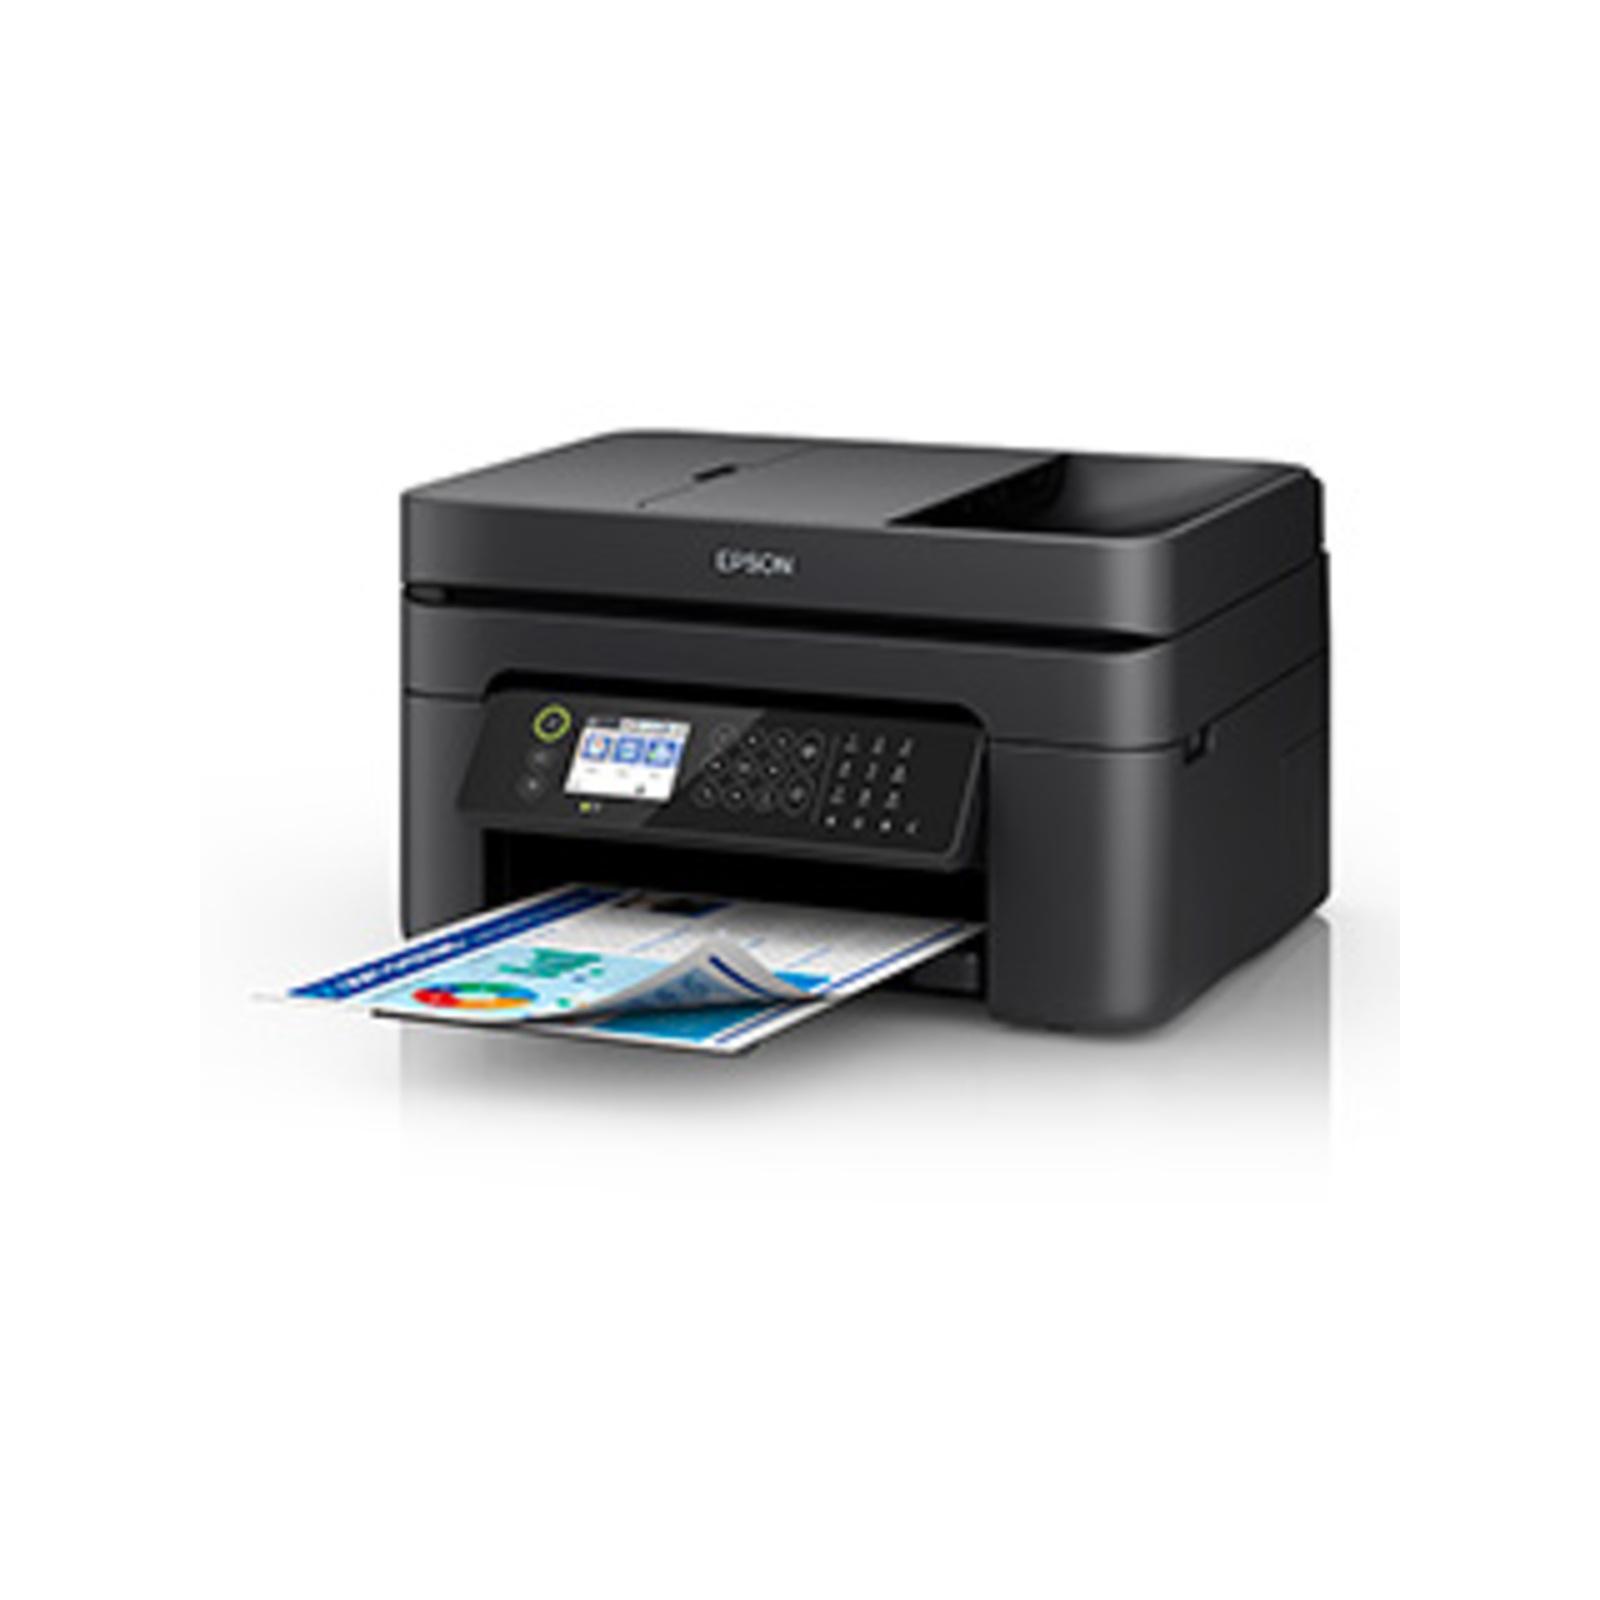 Epson WorkForce WF-2850 A4 Colour Inkjet MFP - Print, Copy, Scan, Fax, Wi-Fi Direct